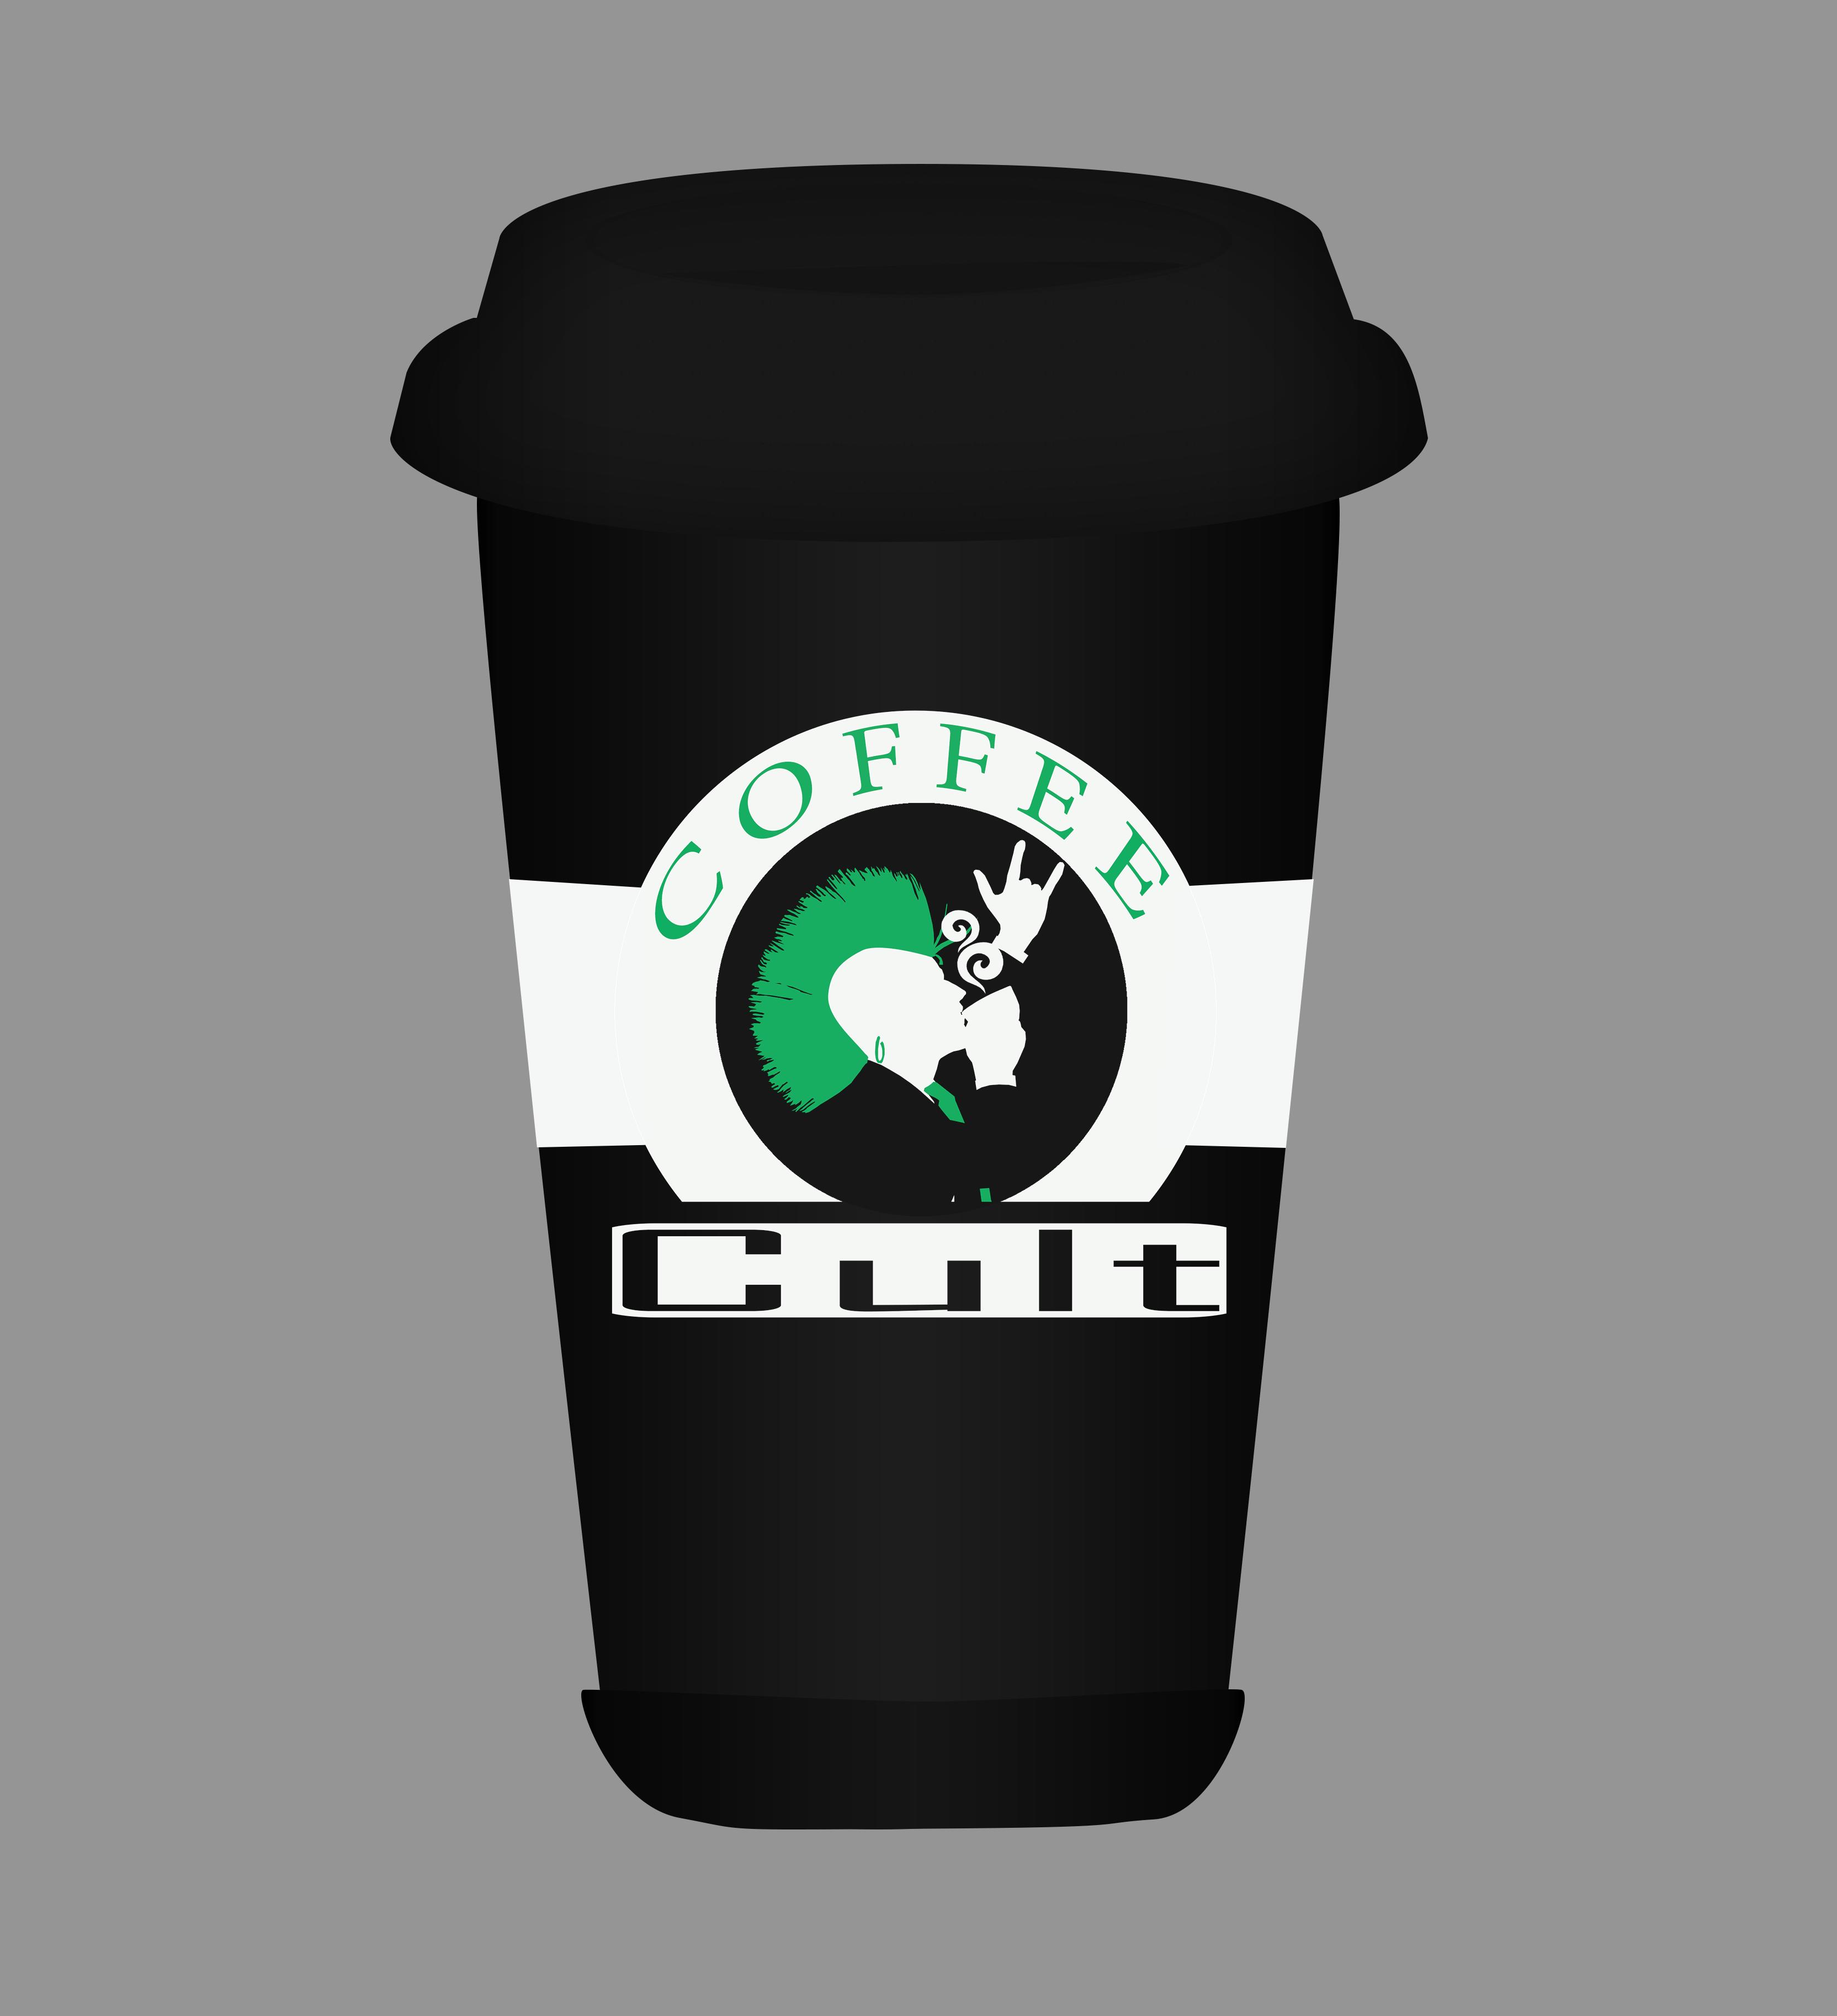 Логотип и фирменный стиль для компании COFFEE CULT фото f_5565bc6636f863a8.png